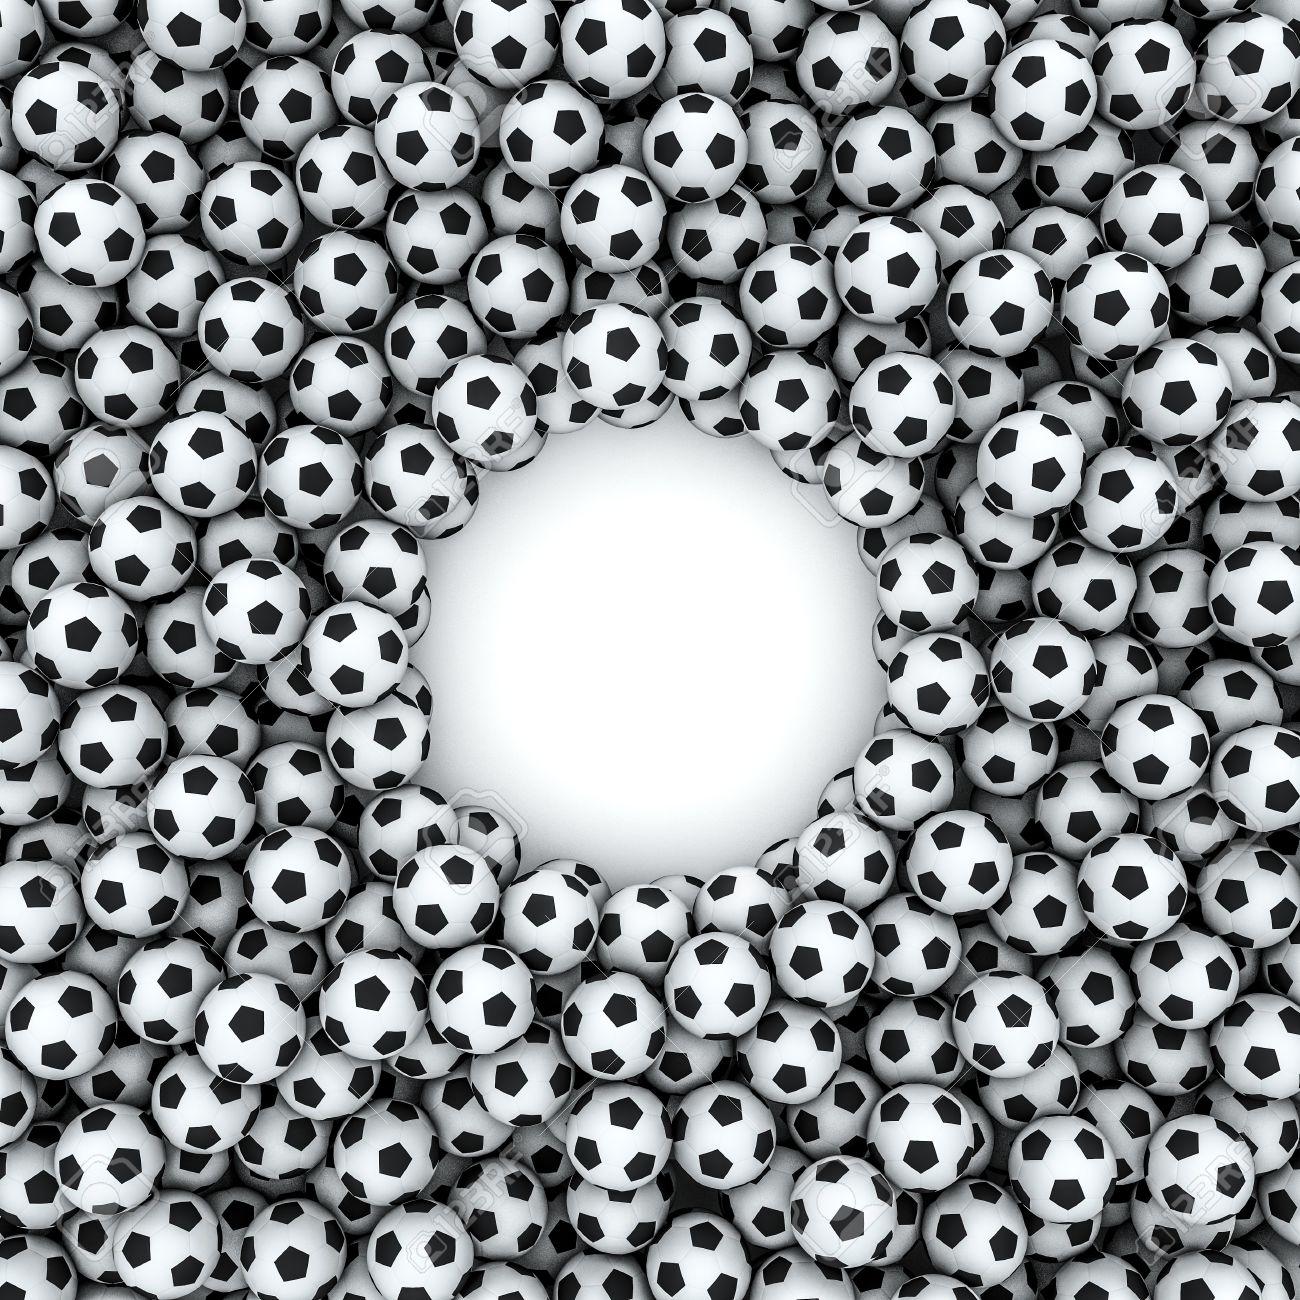 Soccer balls frame 3d render of hundreds of soccer balls framing soccer balls frame 3d render of hundreds of soccer balls framing copy space stock photo jeuxipadfo Images